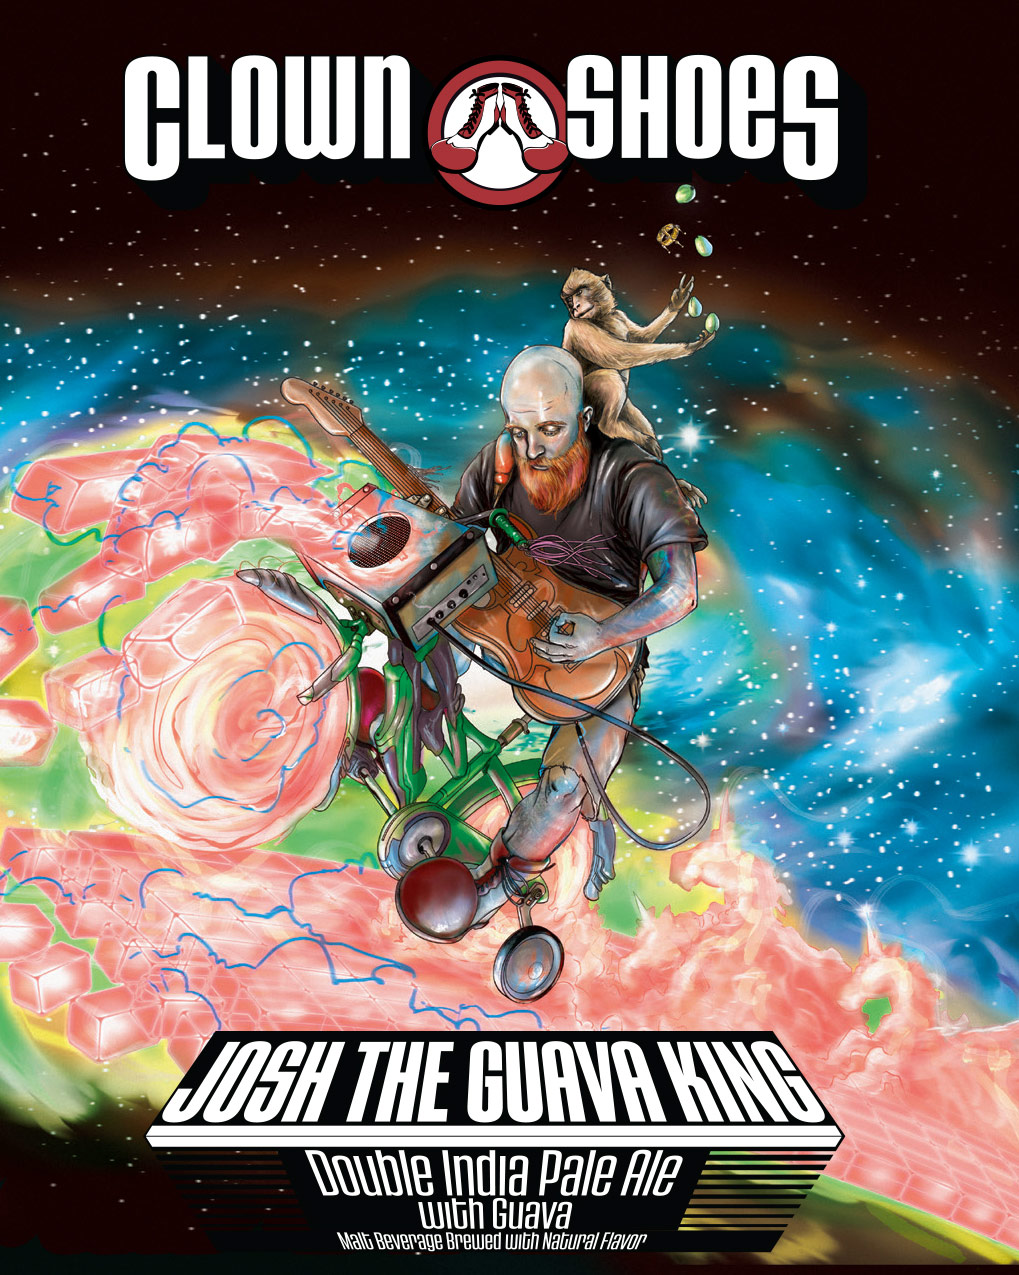 Josh the Guava King